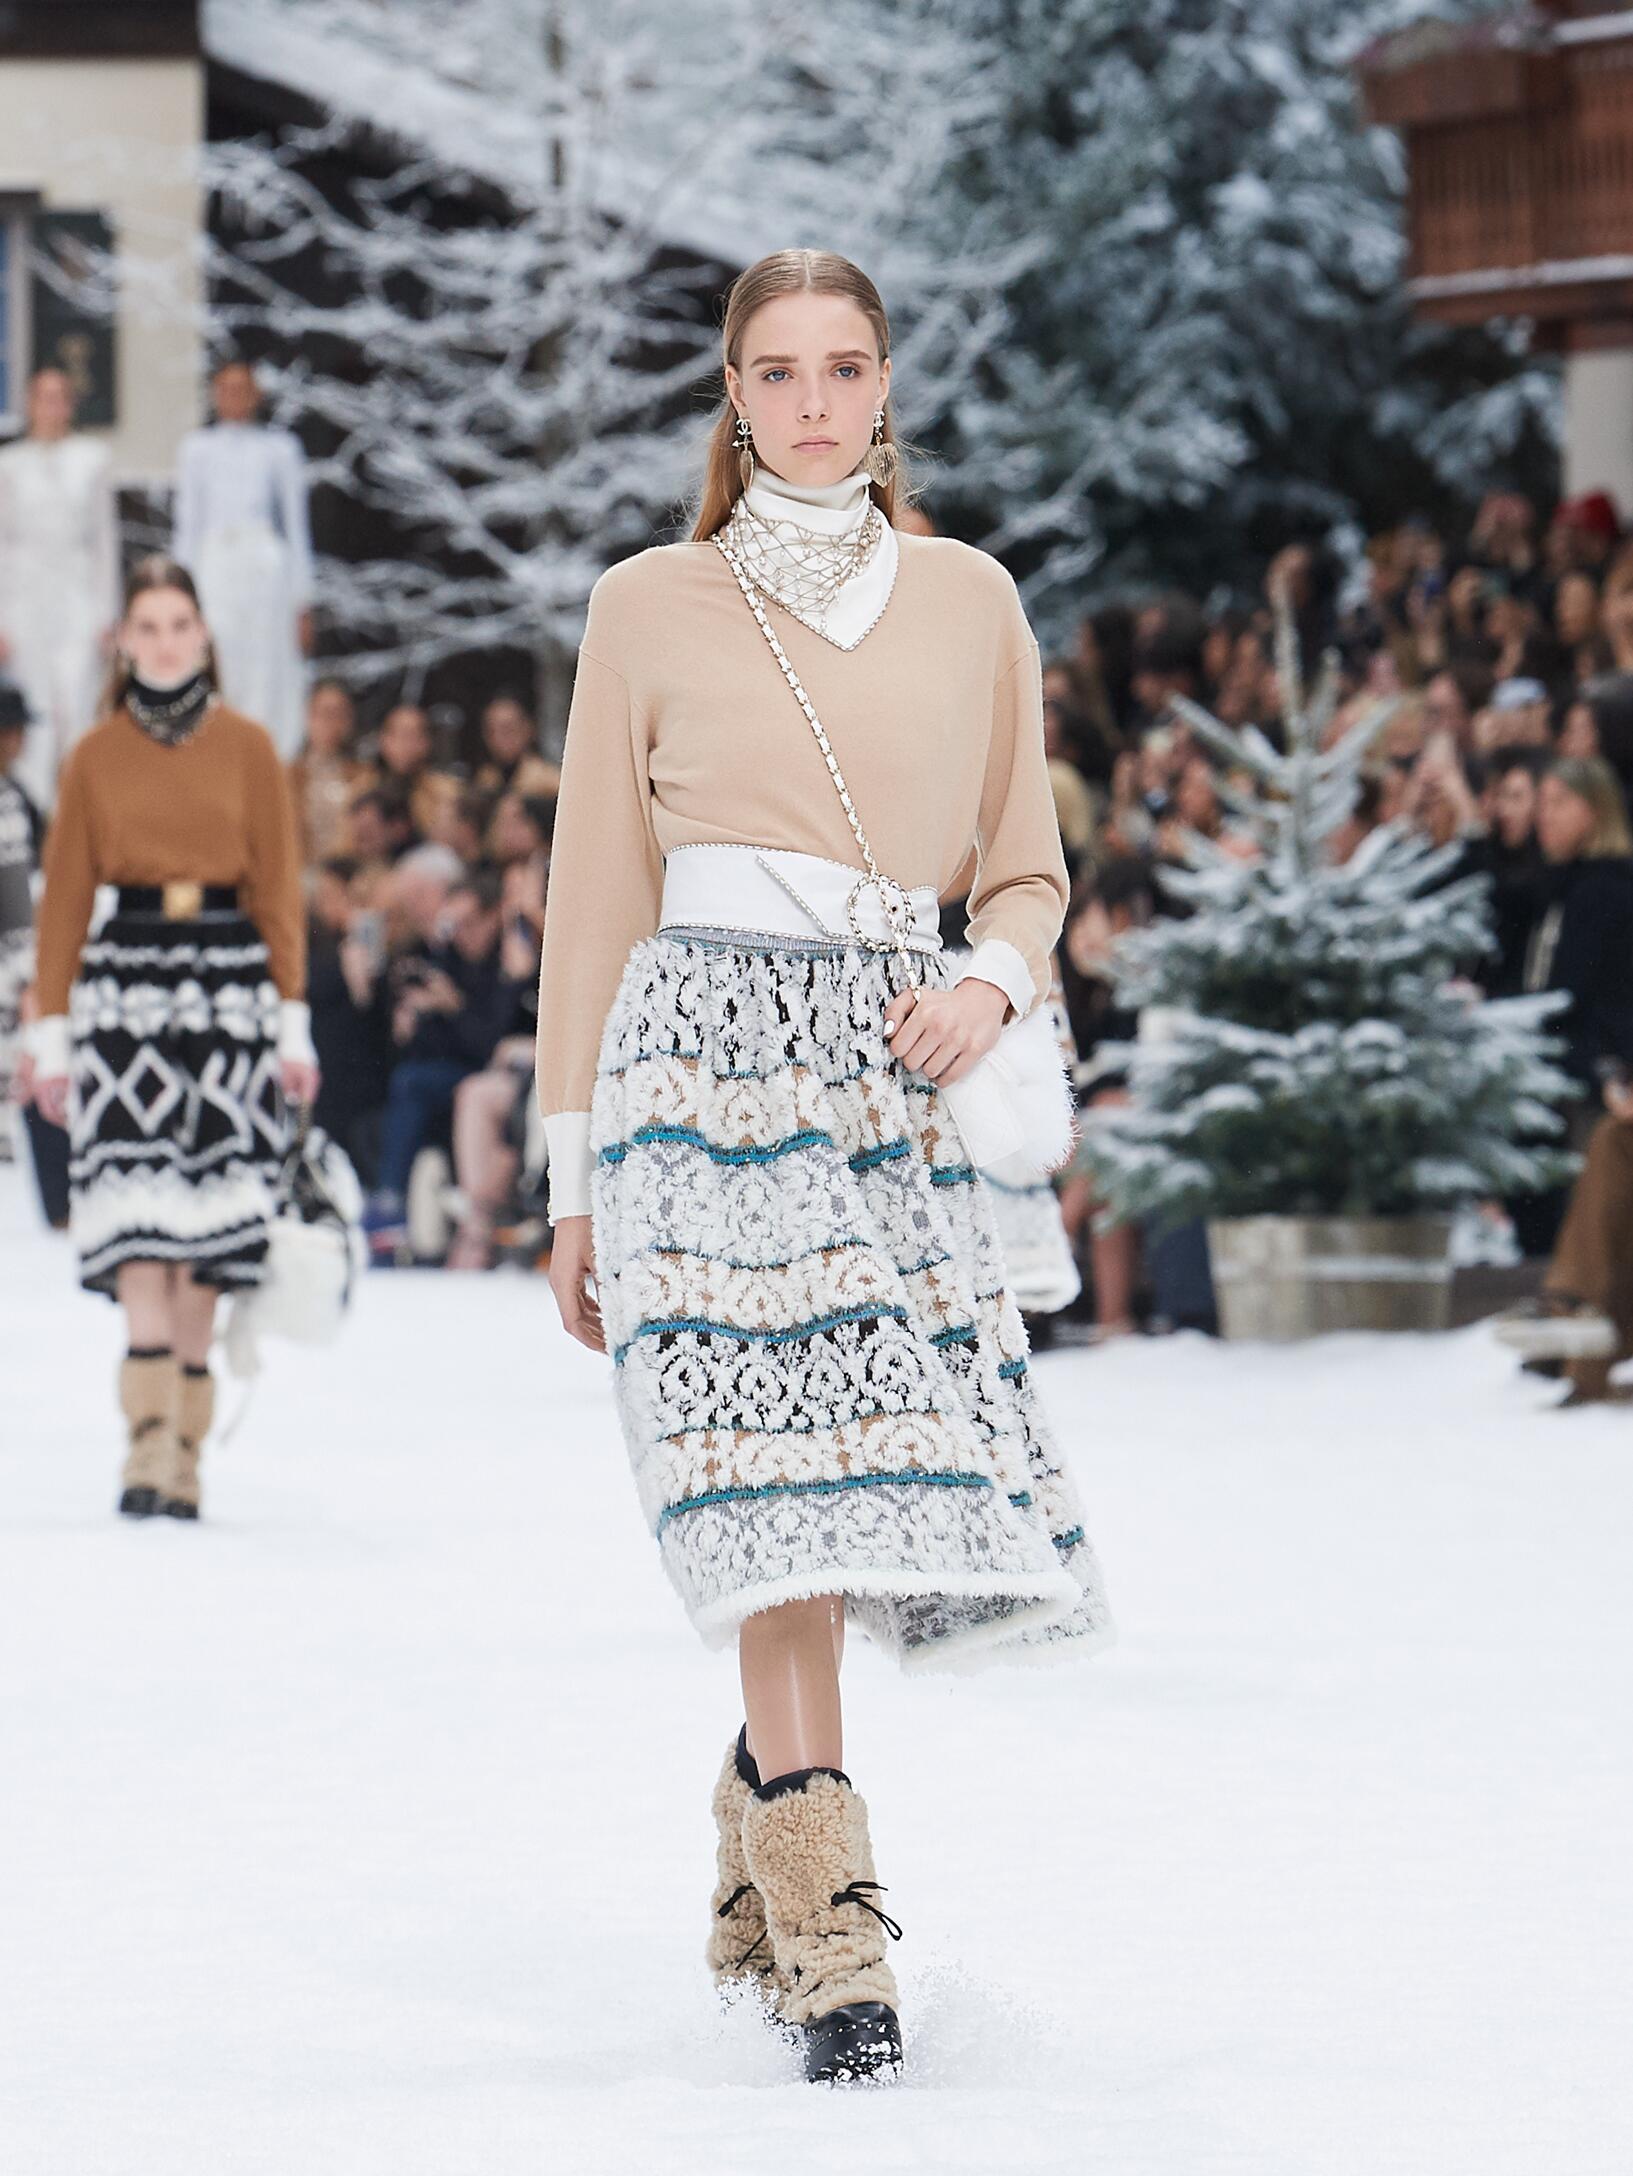 Chanel Fall Winter 2019